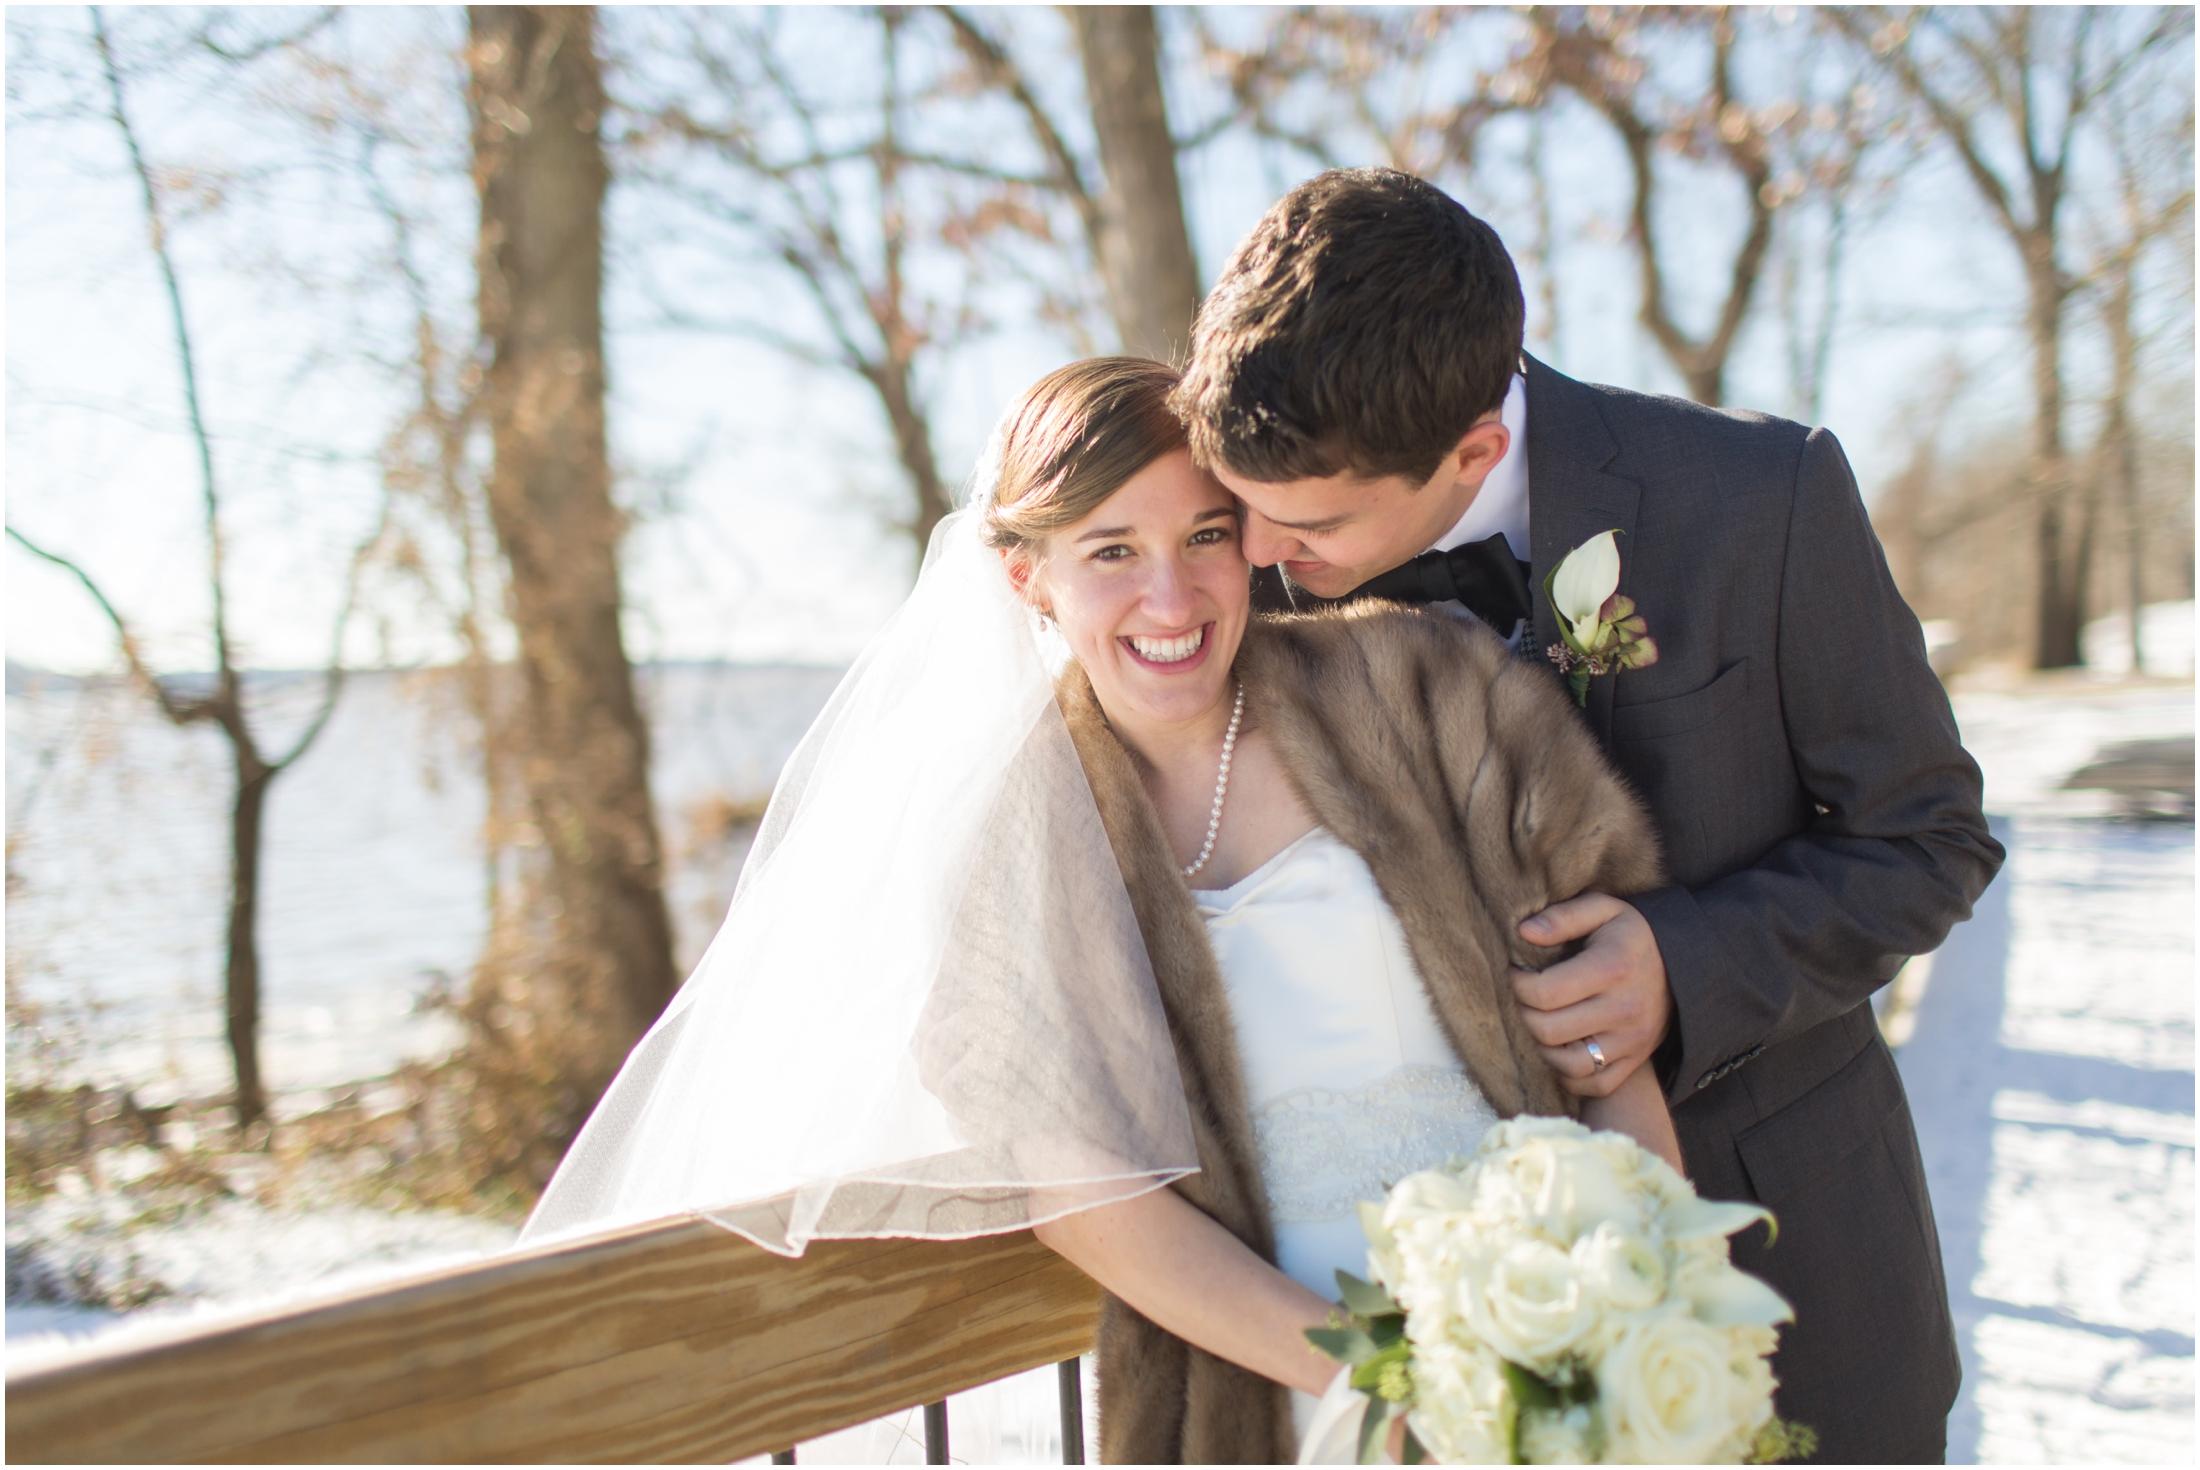 bride-groom-husband-wedding-899.jpg